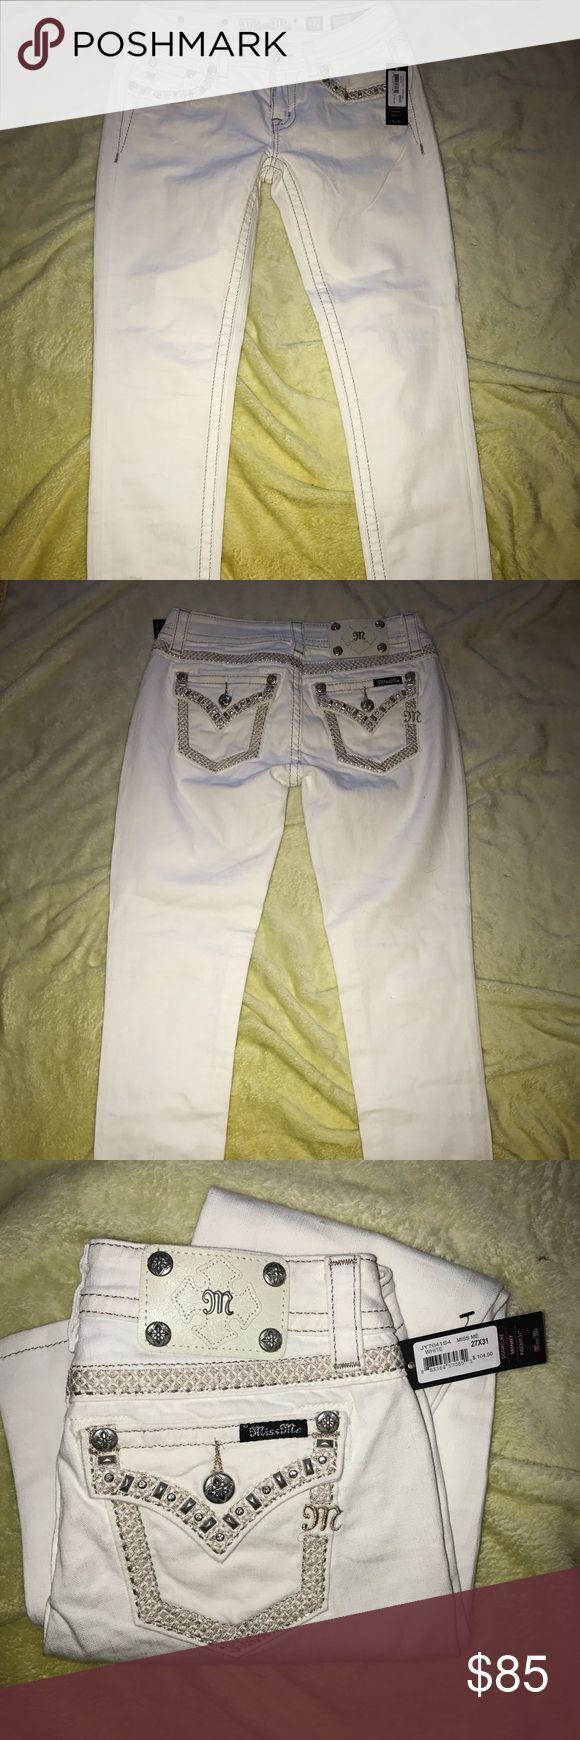 Brand new Miss me Brand new white 27/31 Miss Me Jeans Skinny